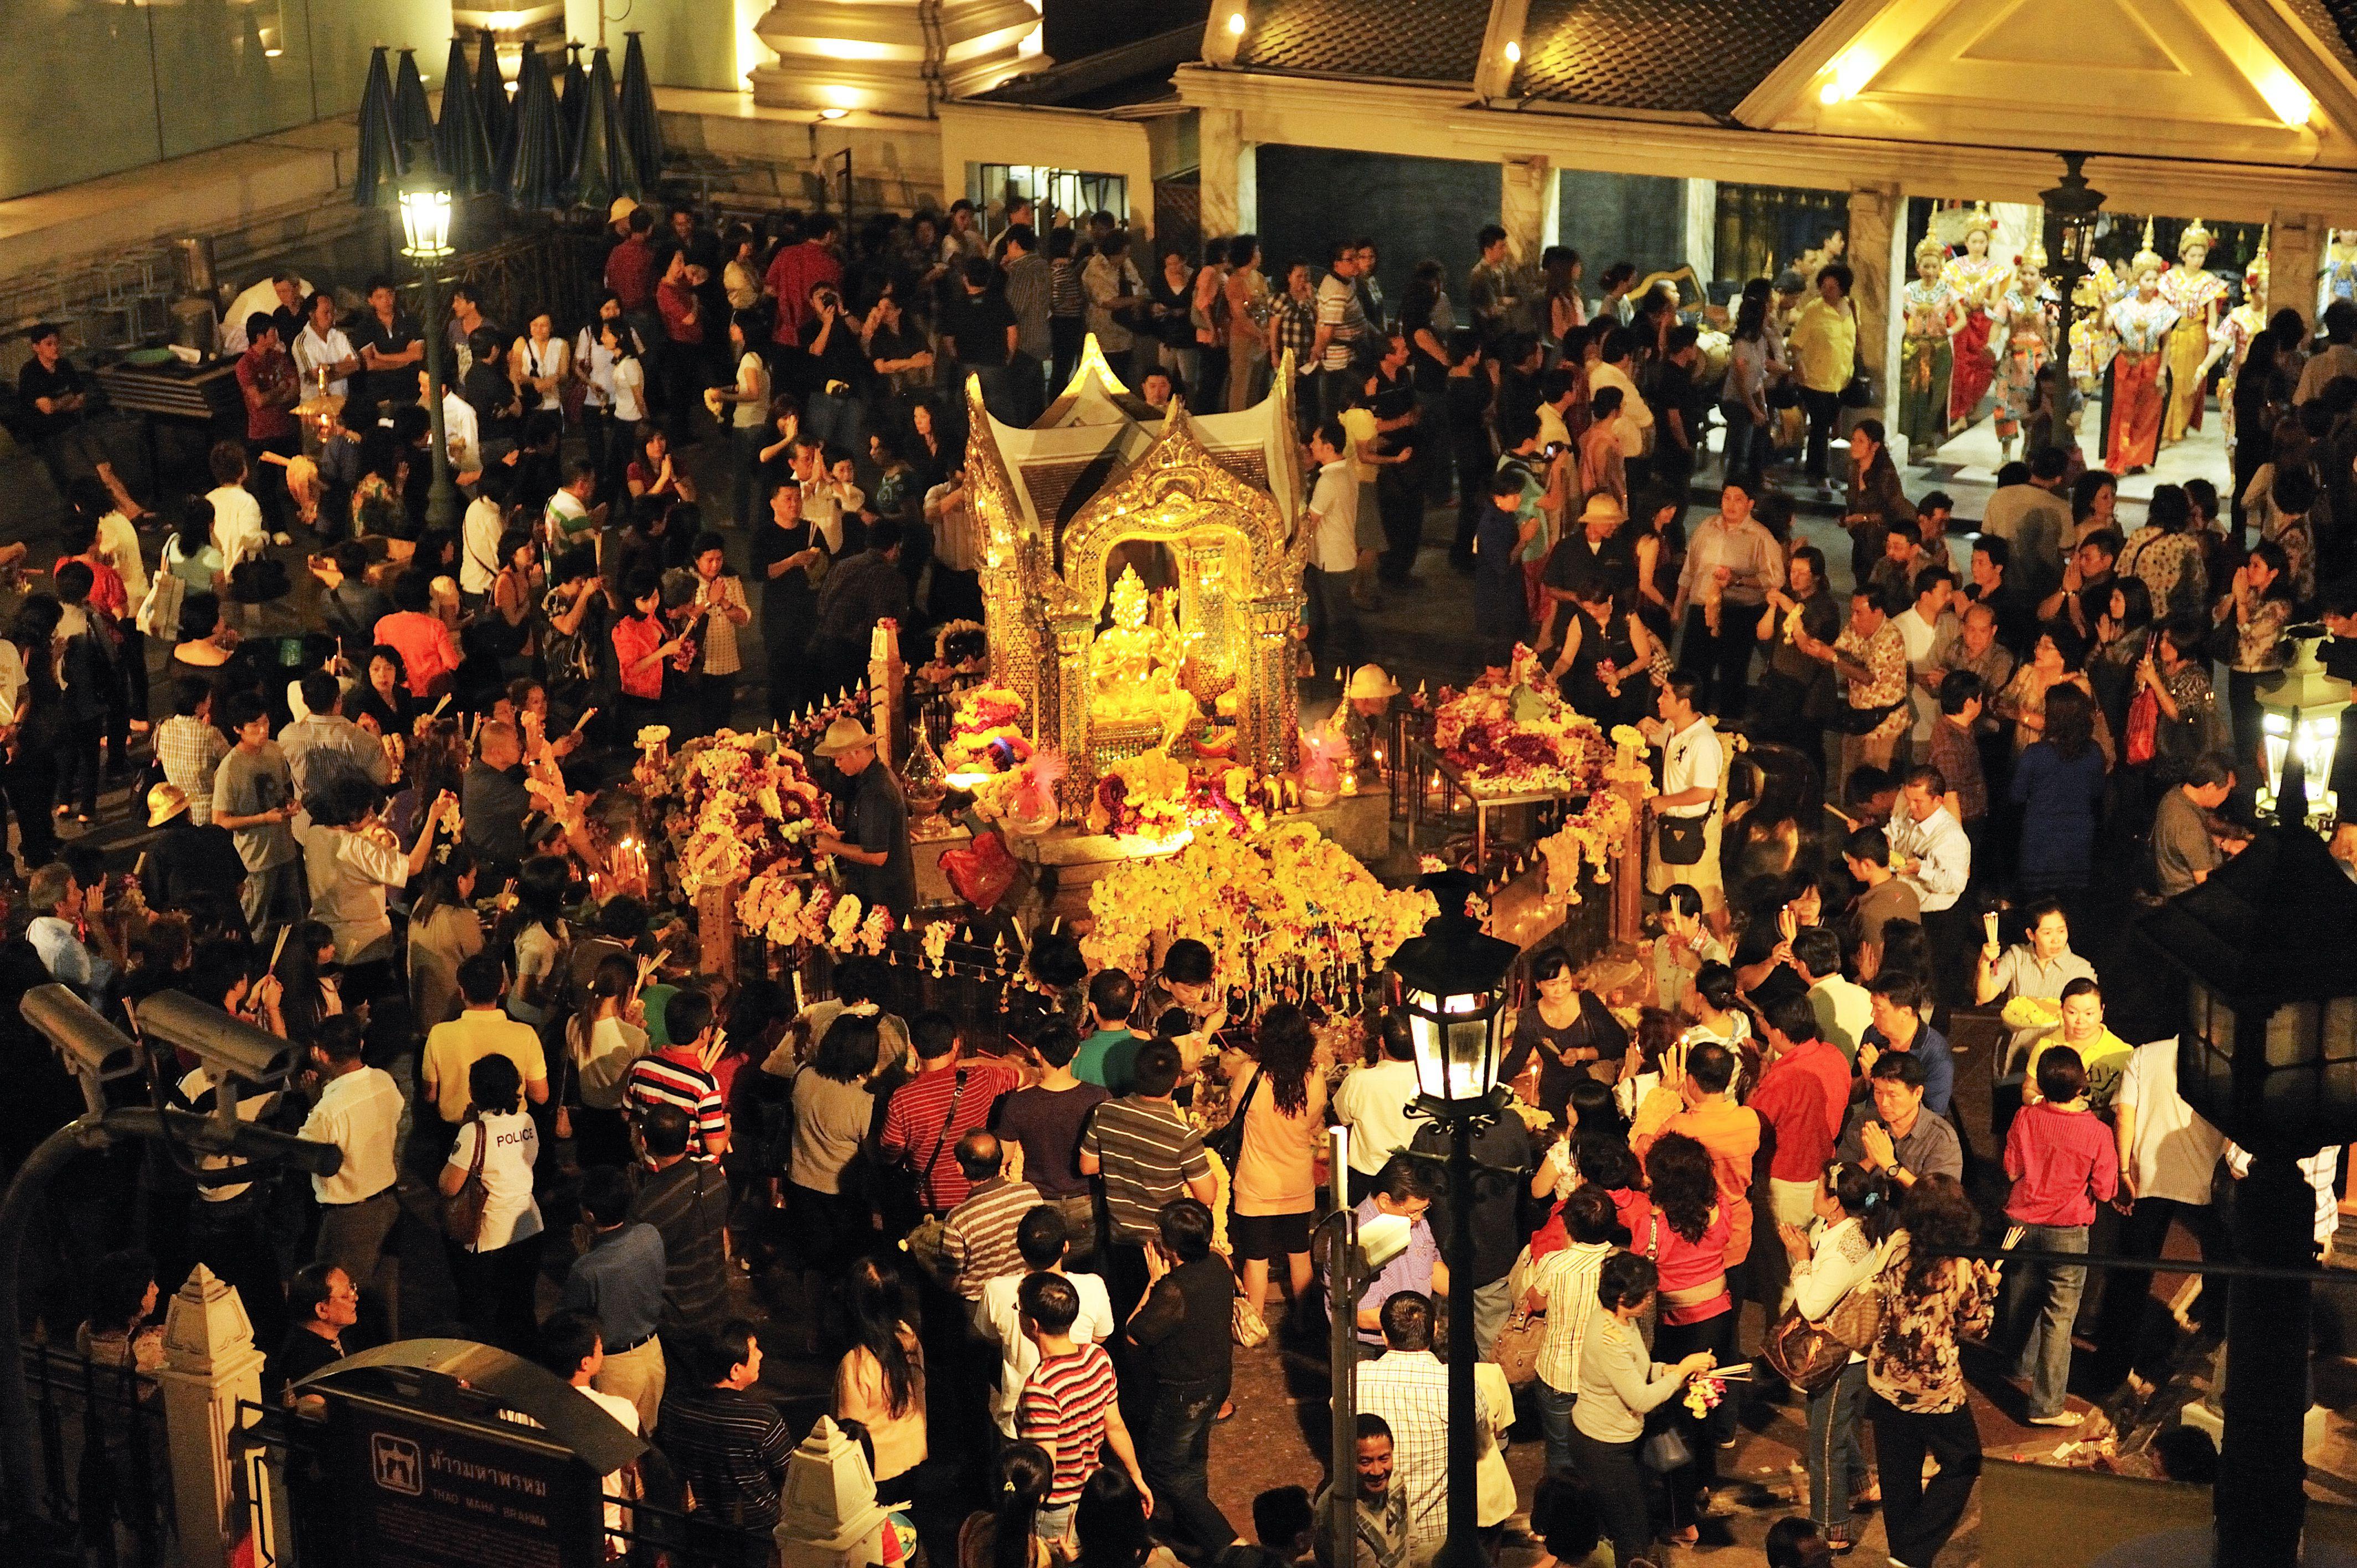 A crowd at Bangkok's Erawan Shrine